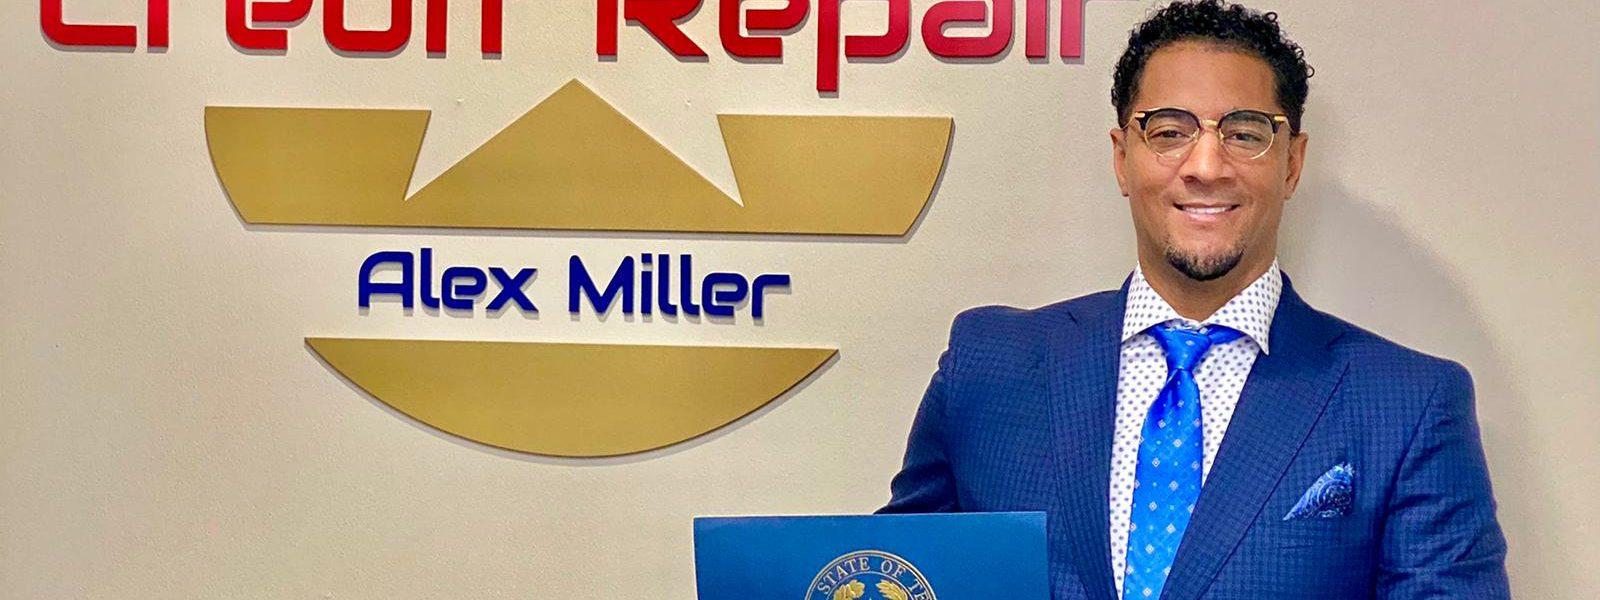 Credit Repair Specialist Alex Miller's Handbook on Repairing Your Own Credit Score